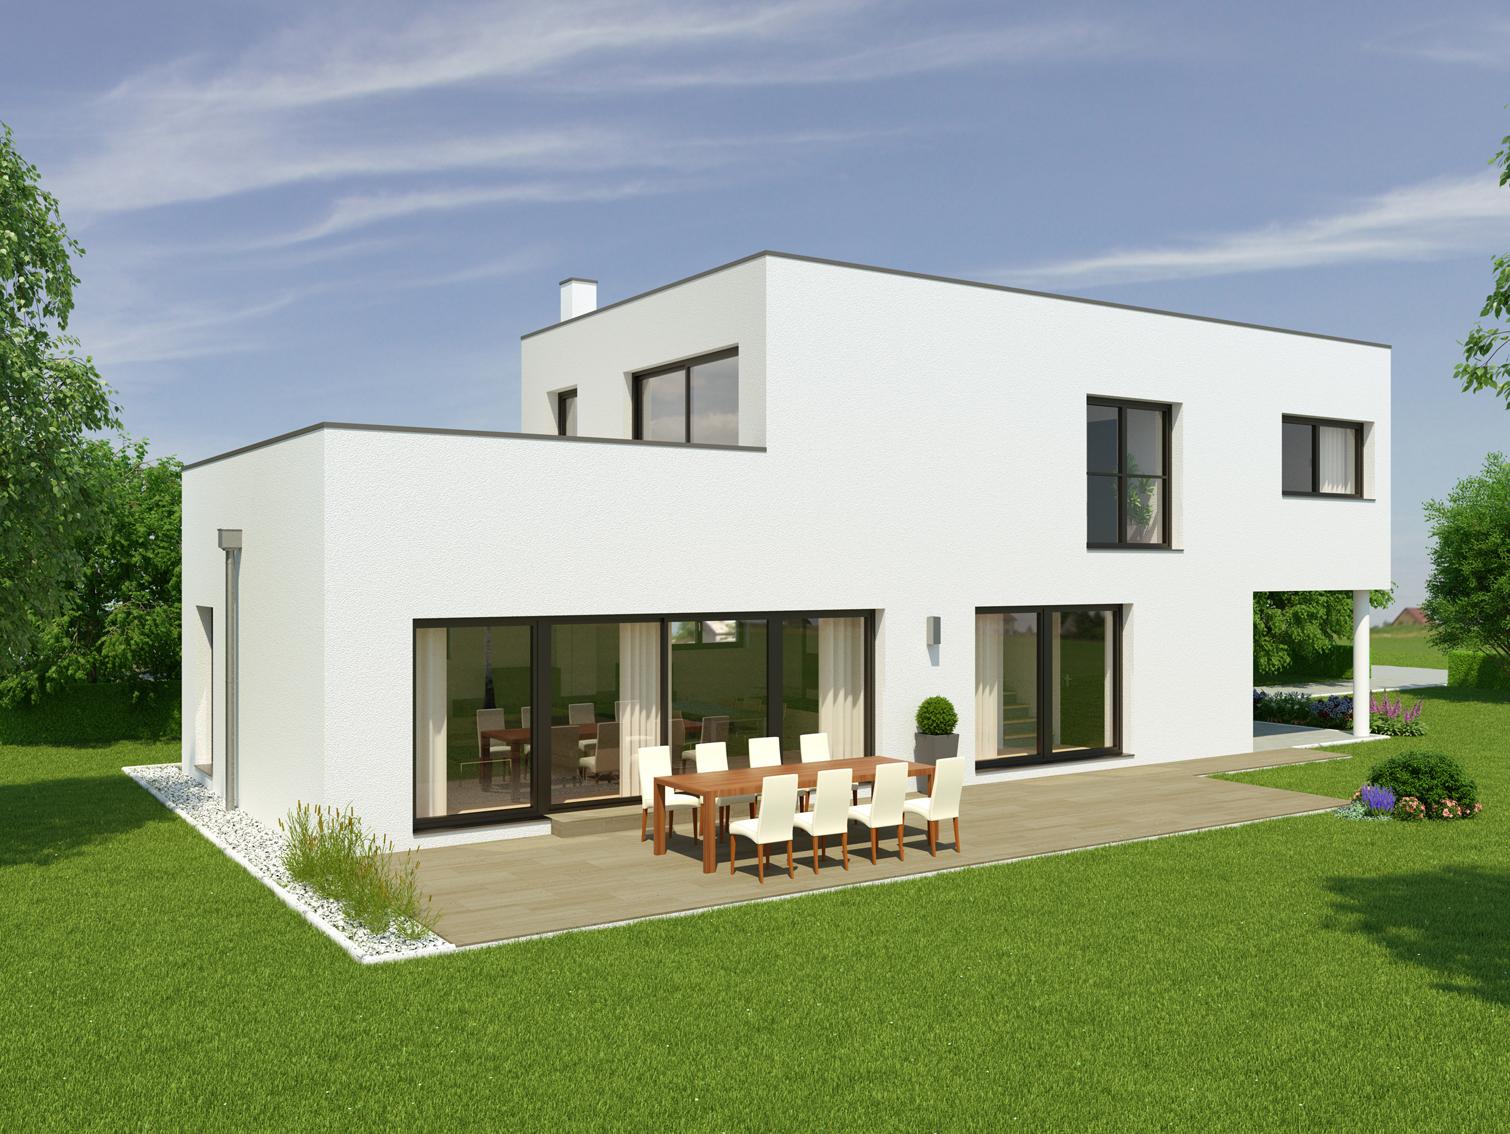 Wimberger Bau Gmbh Neubauprojekte Willhaben At